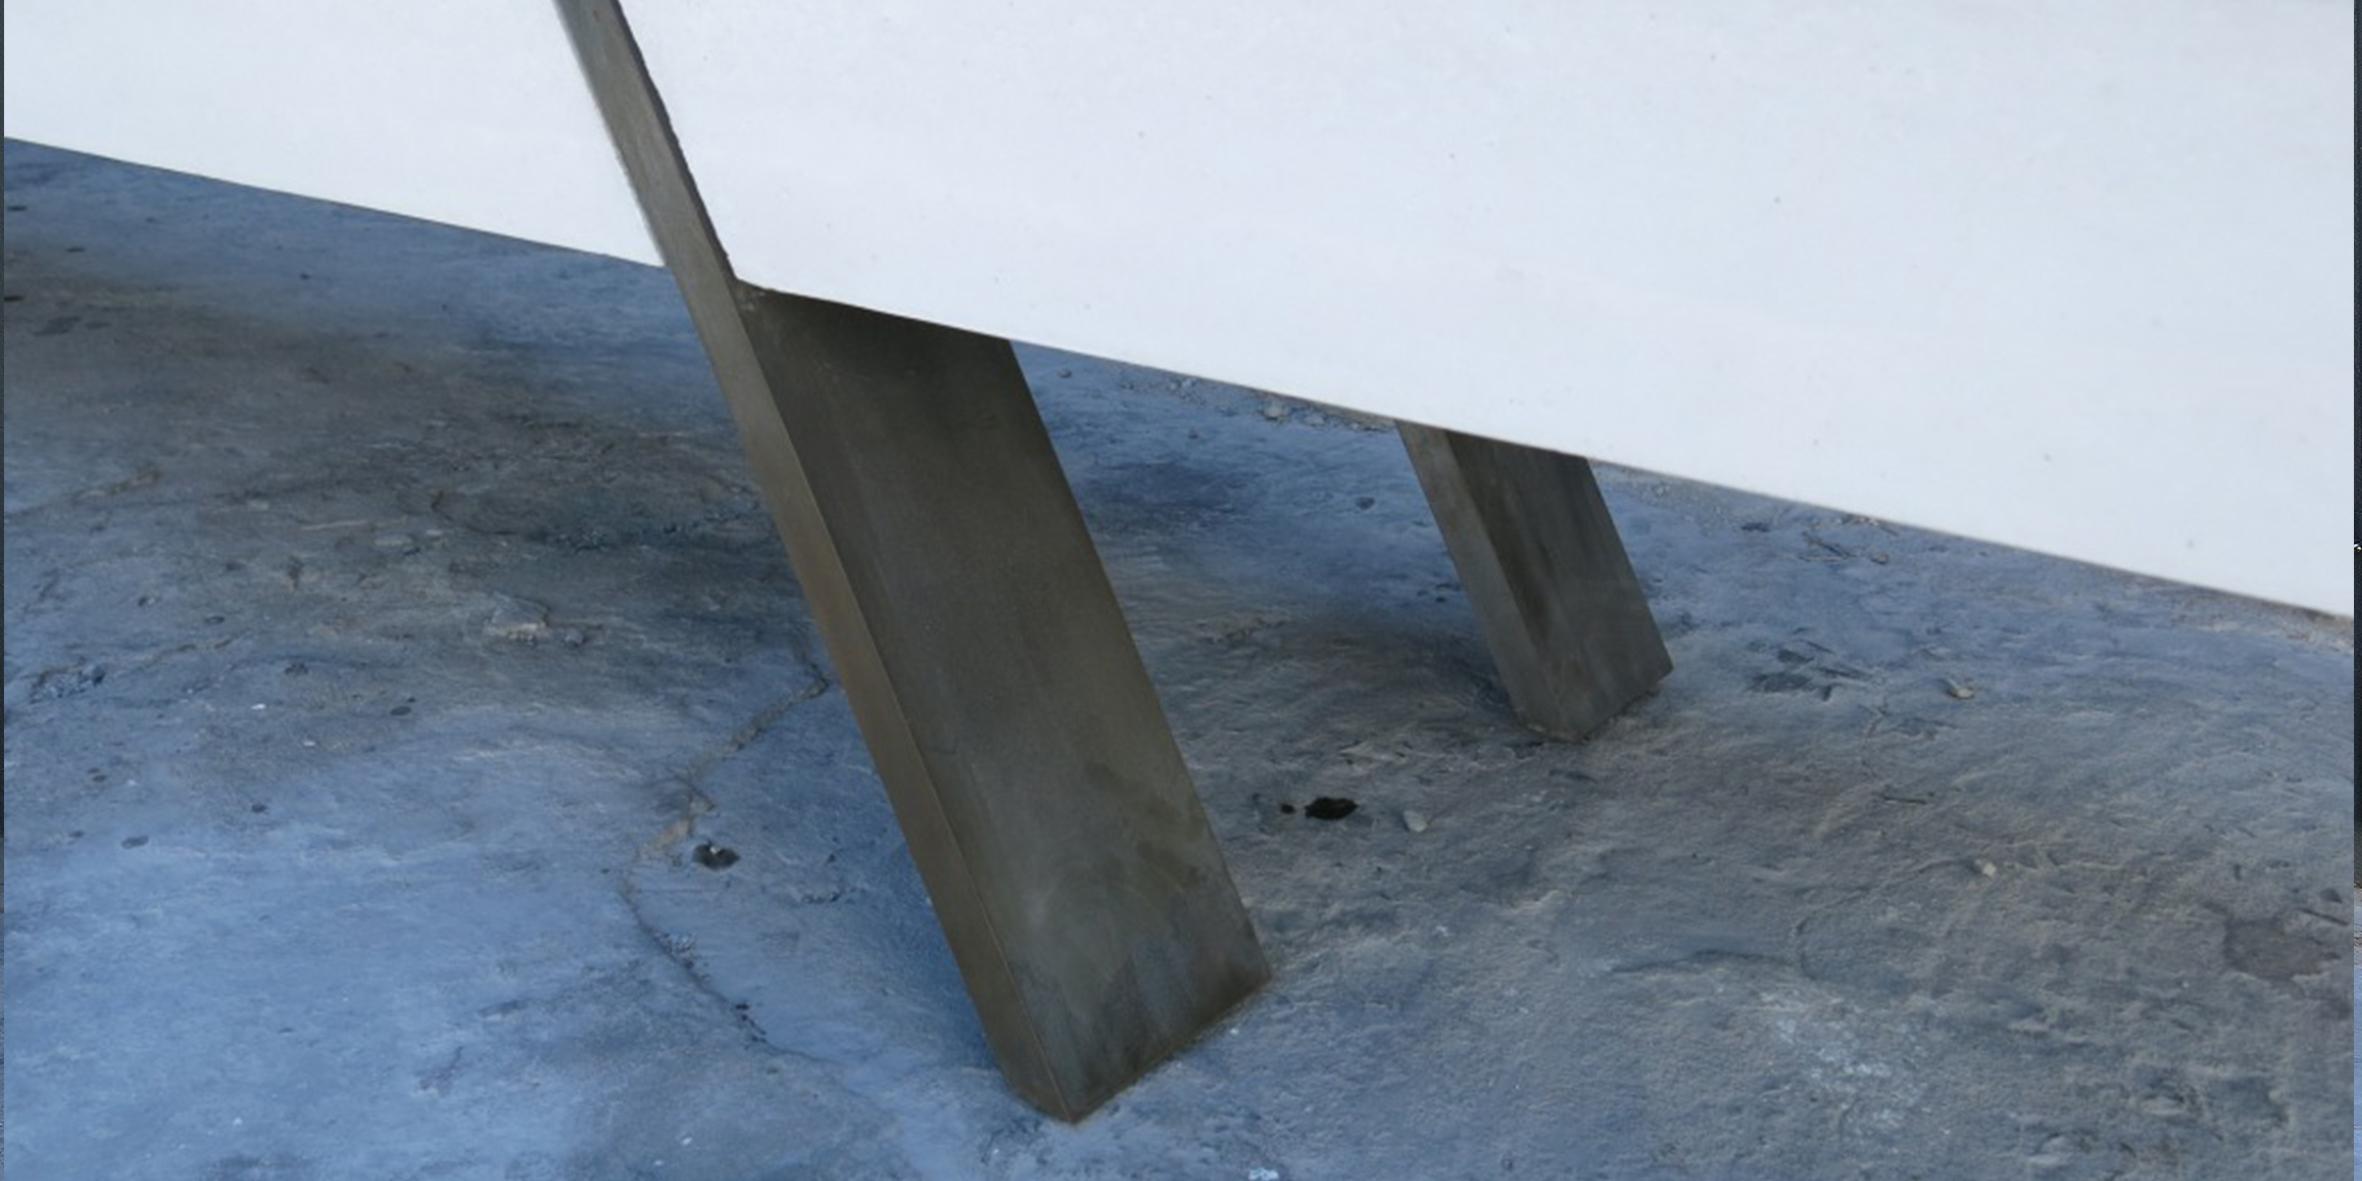 concrete kewitz bench, 3600 l x 500 w x 400 h, solid concrete beam with mild steel legs